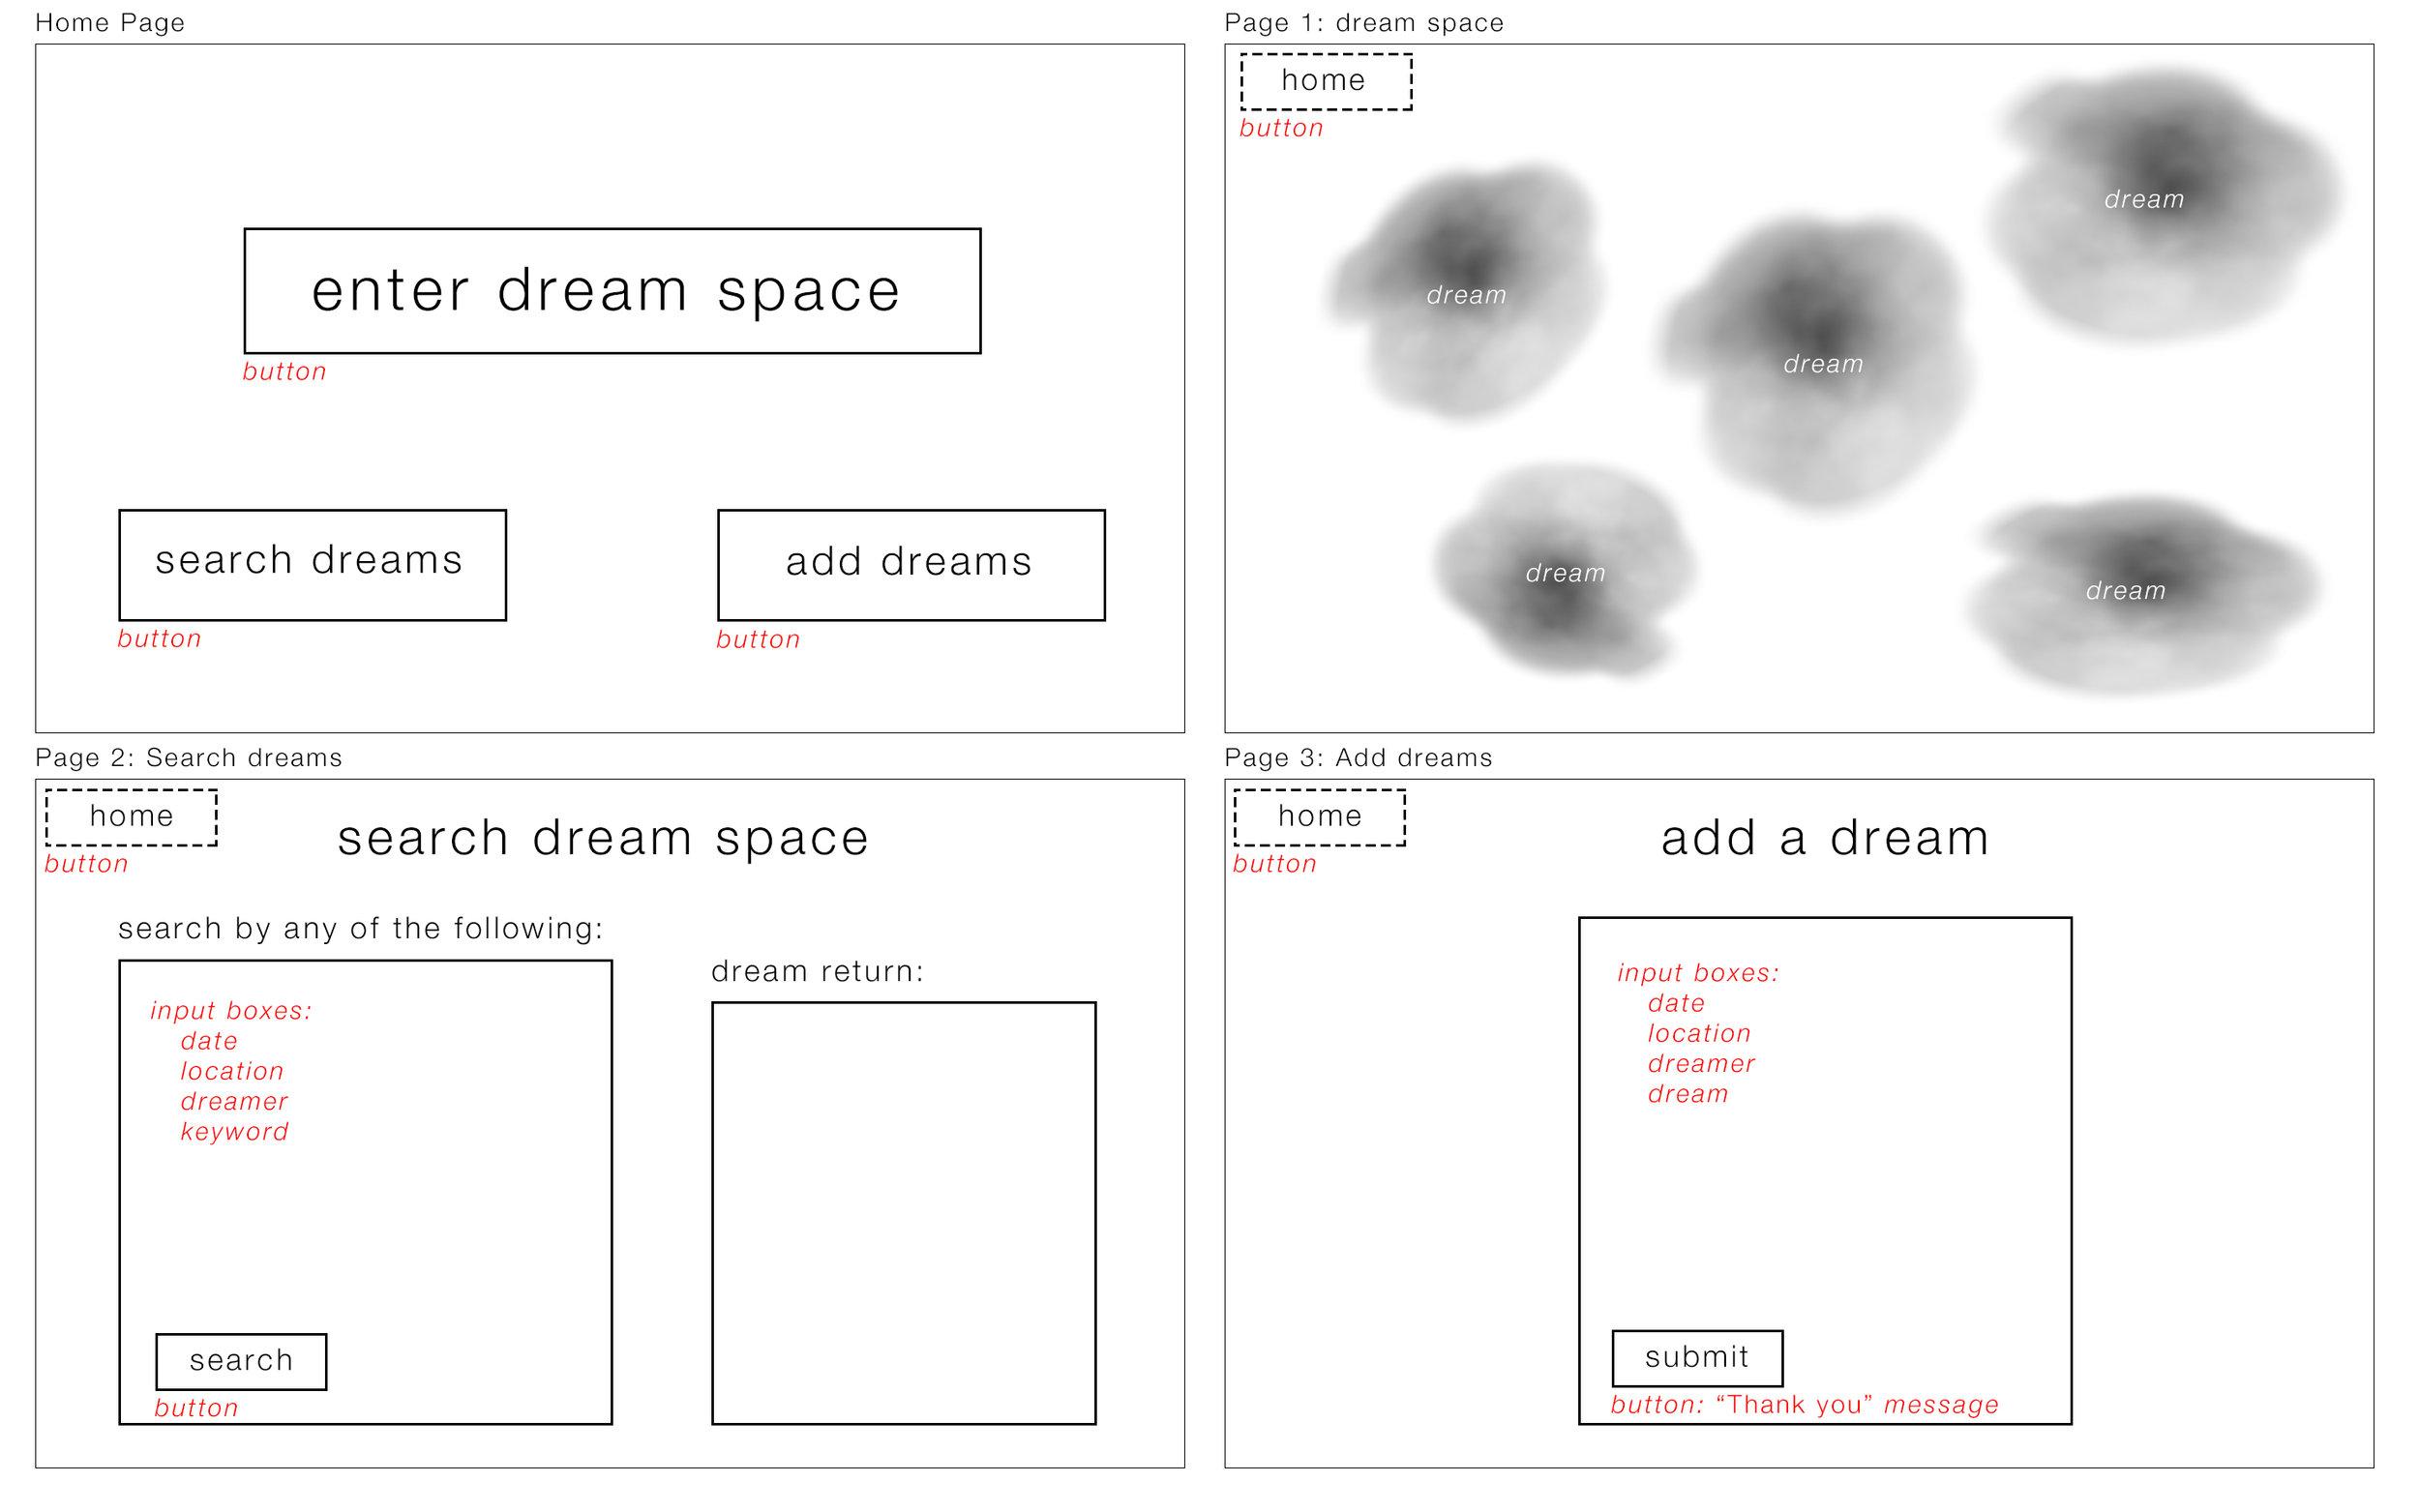 DreamSpace_Wireframe_AmandaMadden.jpg